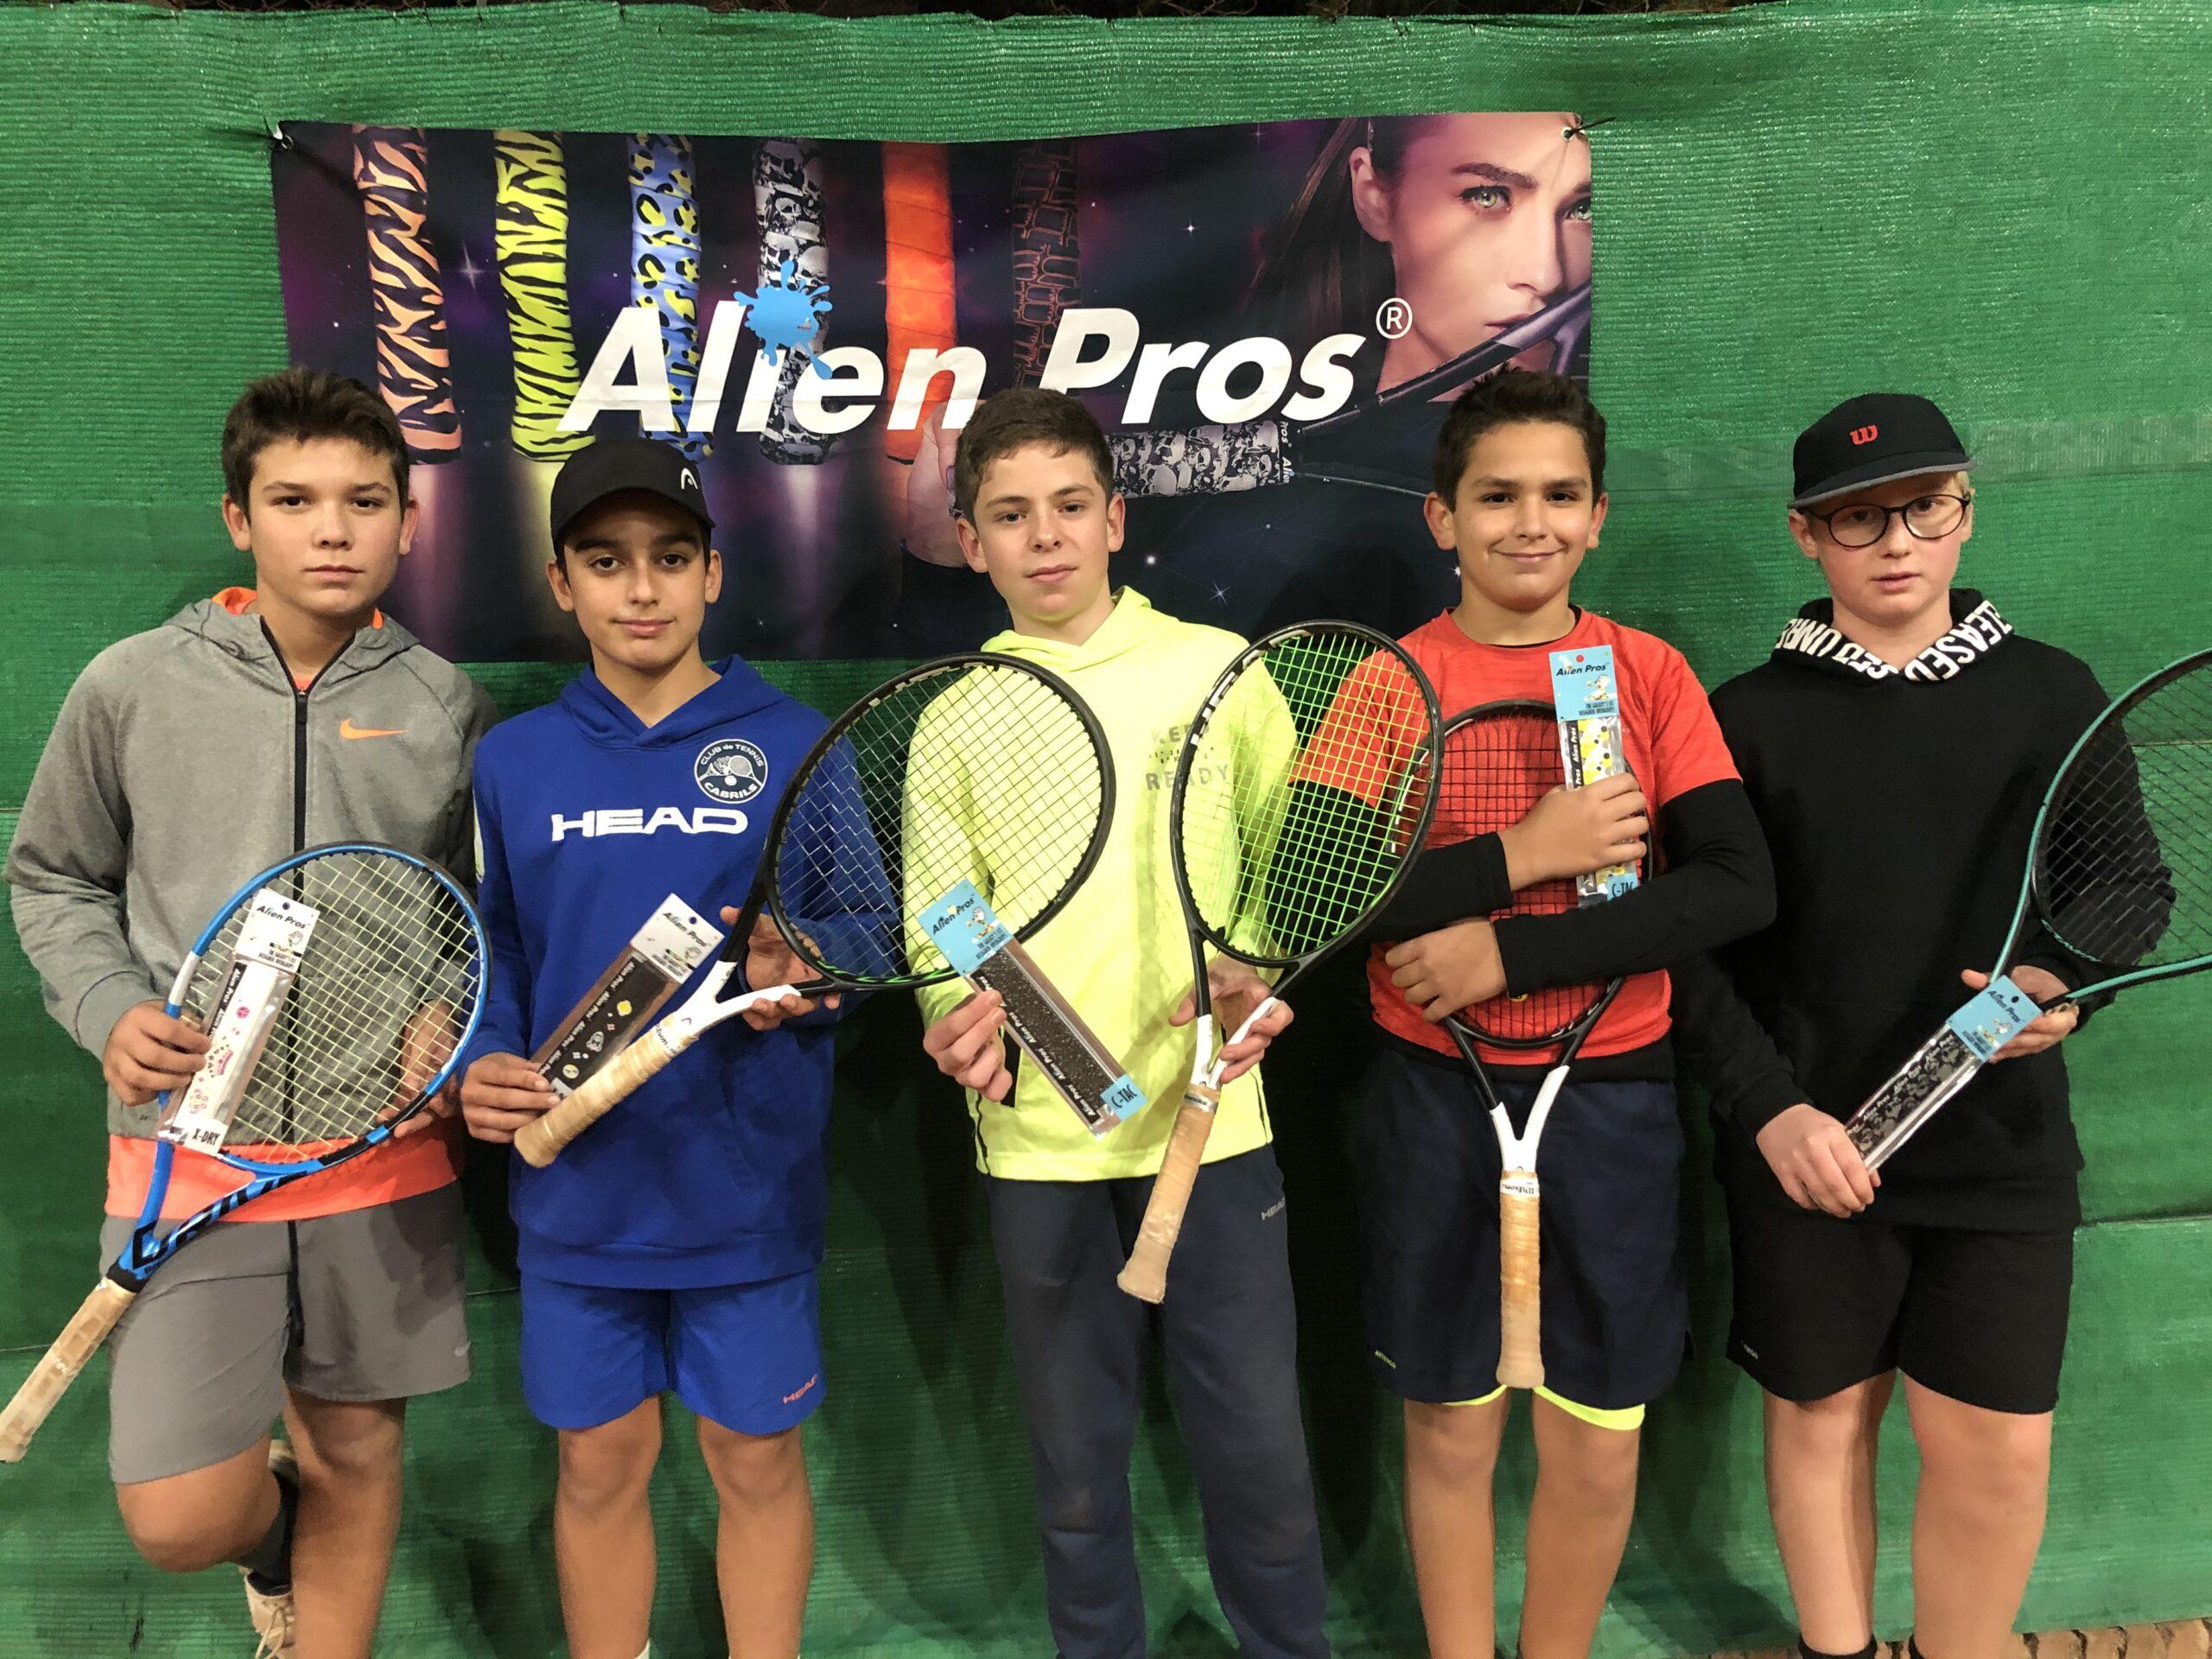 MBA-Tennis-Academy-Alien Pros Alumnos (8)